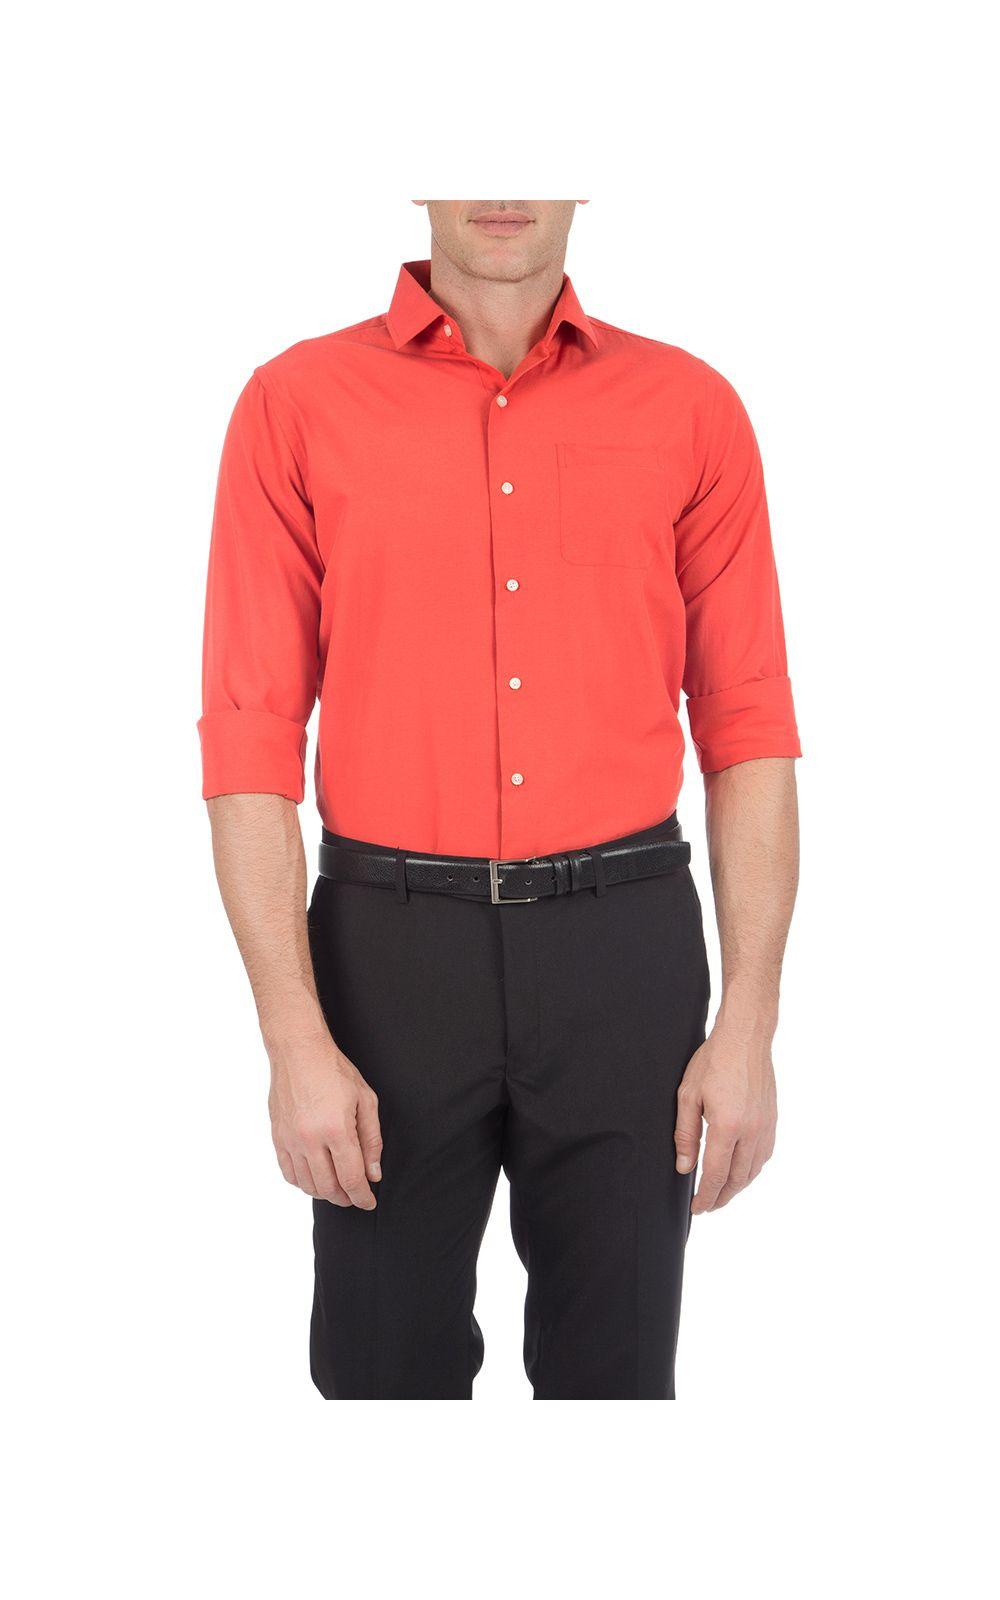 Foto 1 - Camisa Social Masculina Laranja Lisa